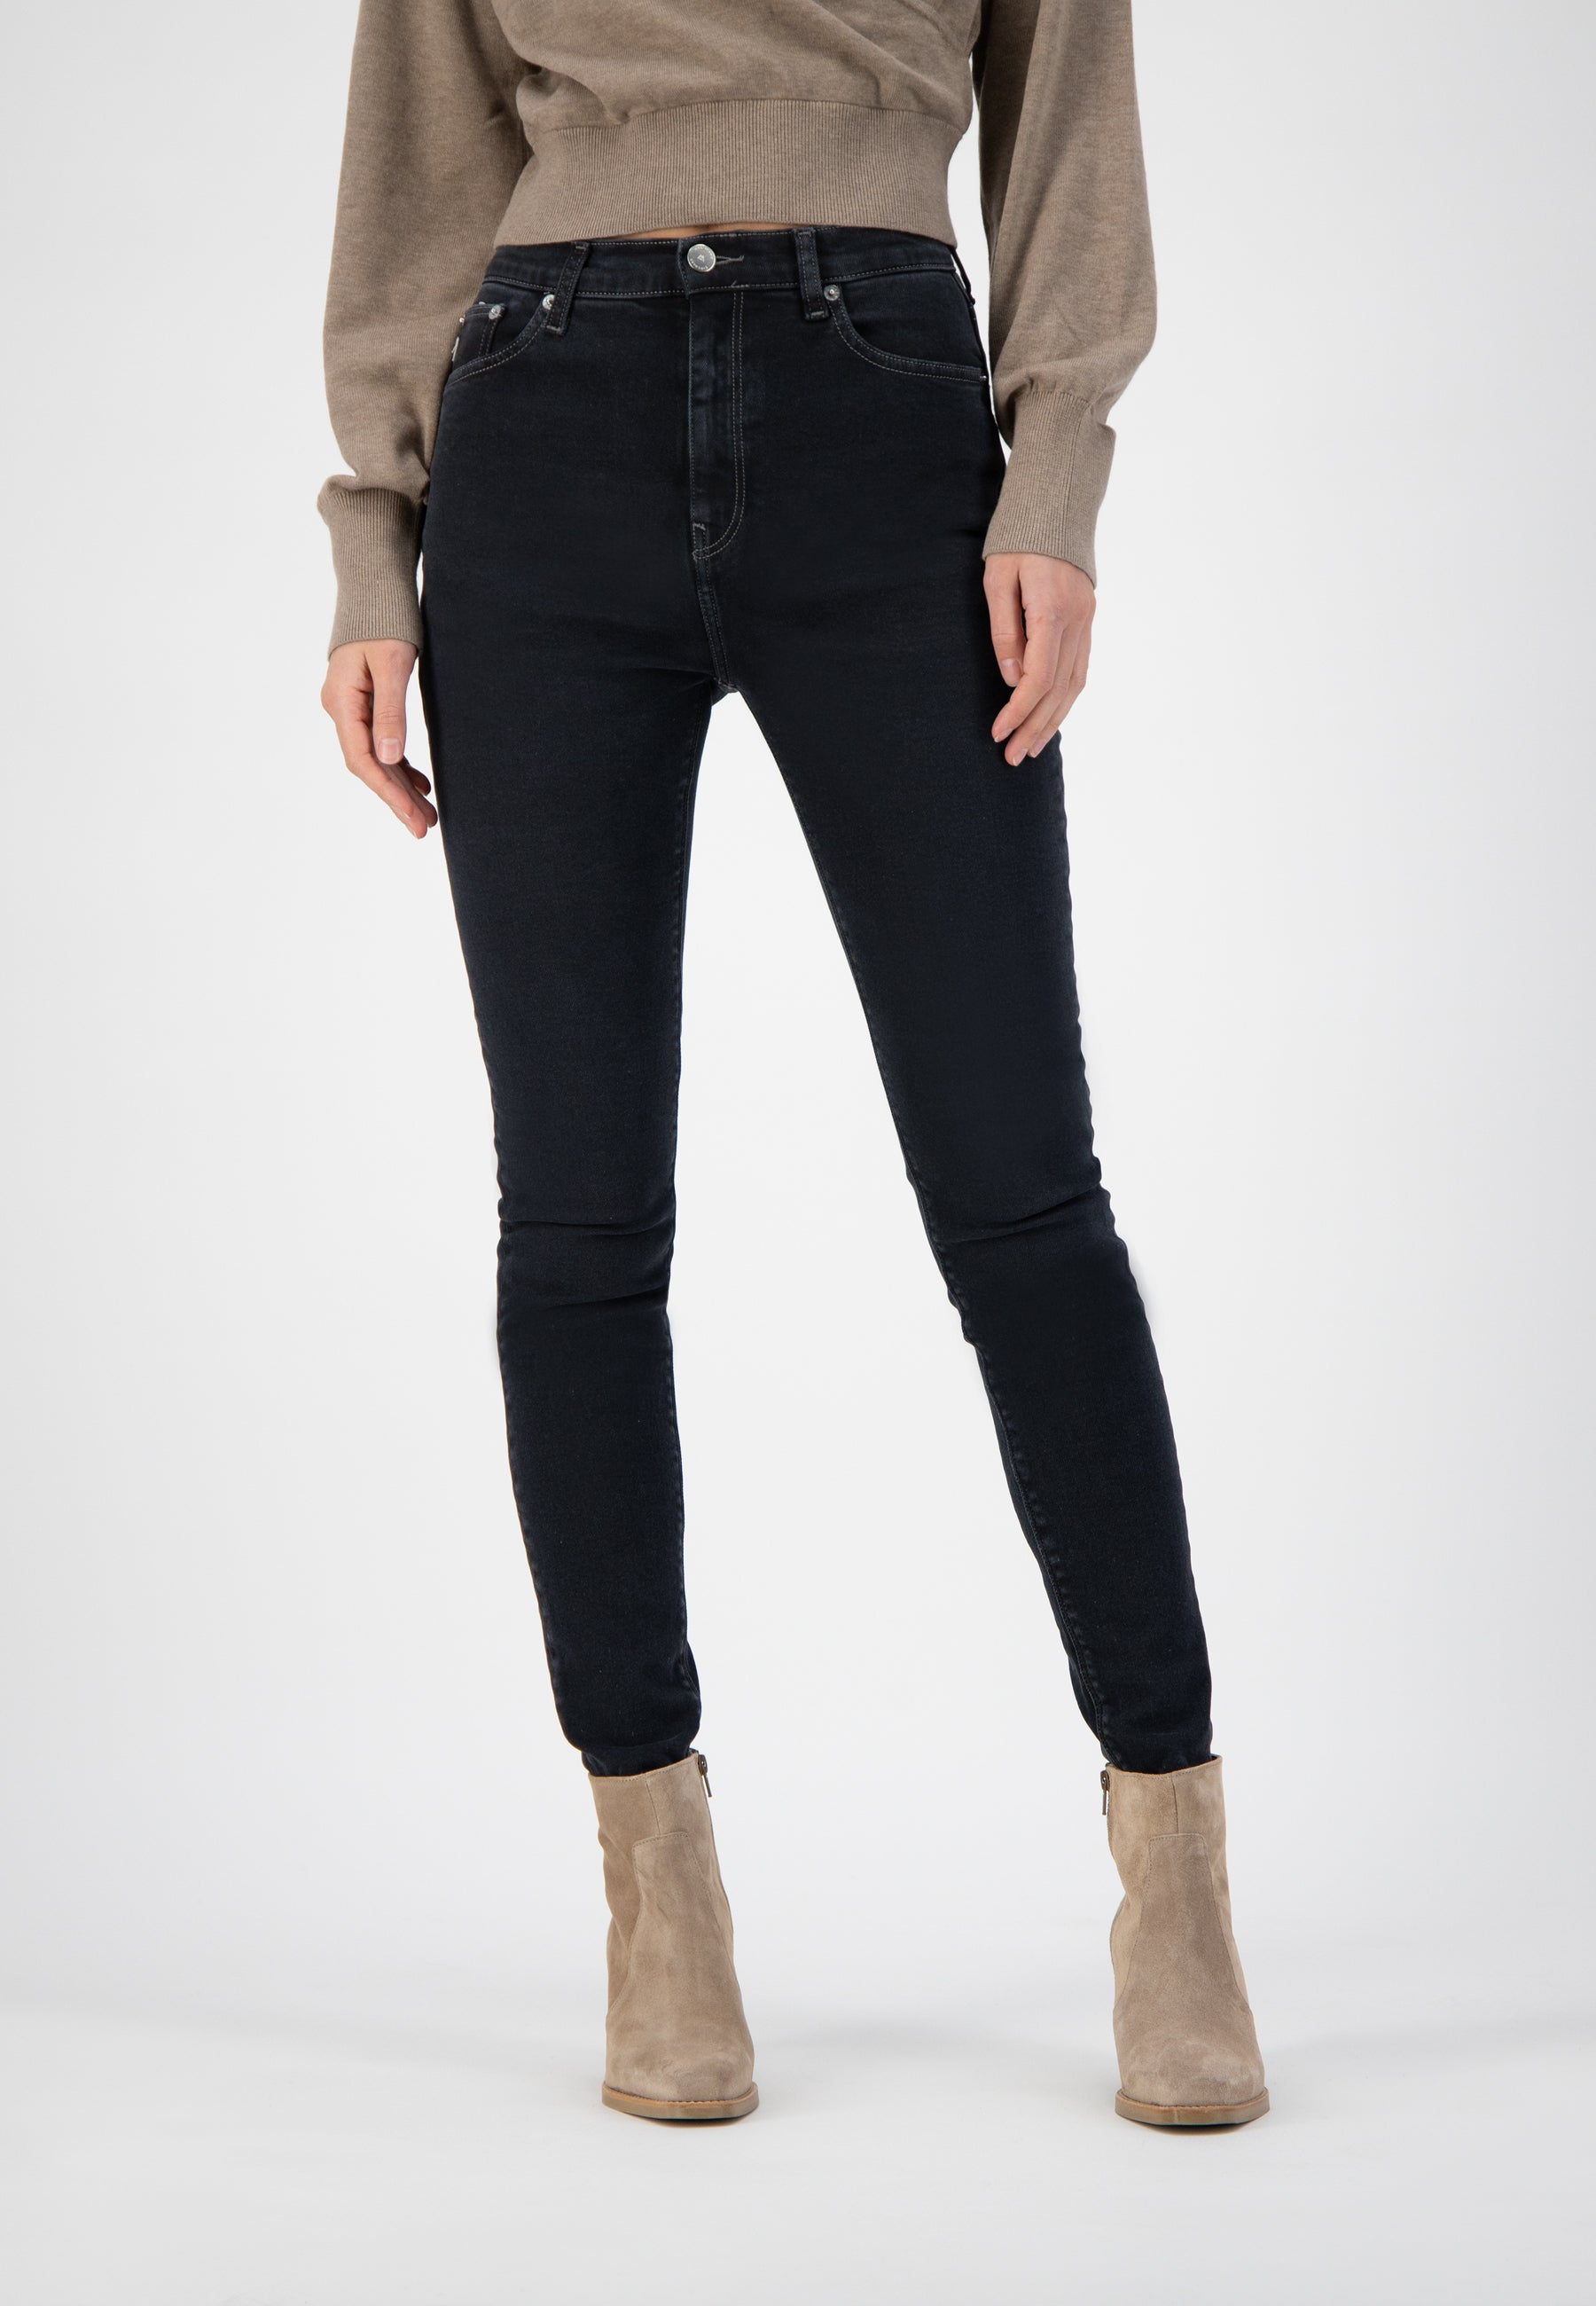 Mud Jeans Sky Rise Skinny - Stone Black